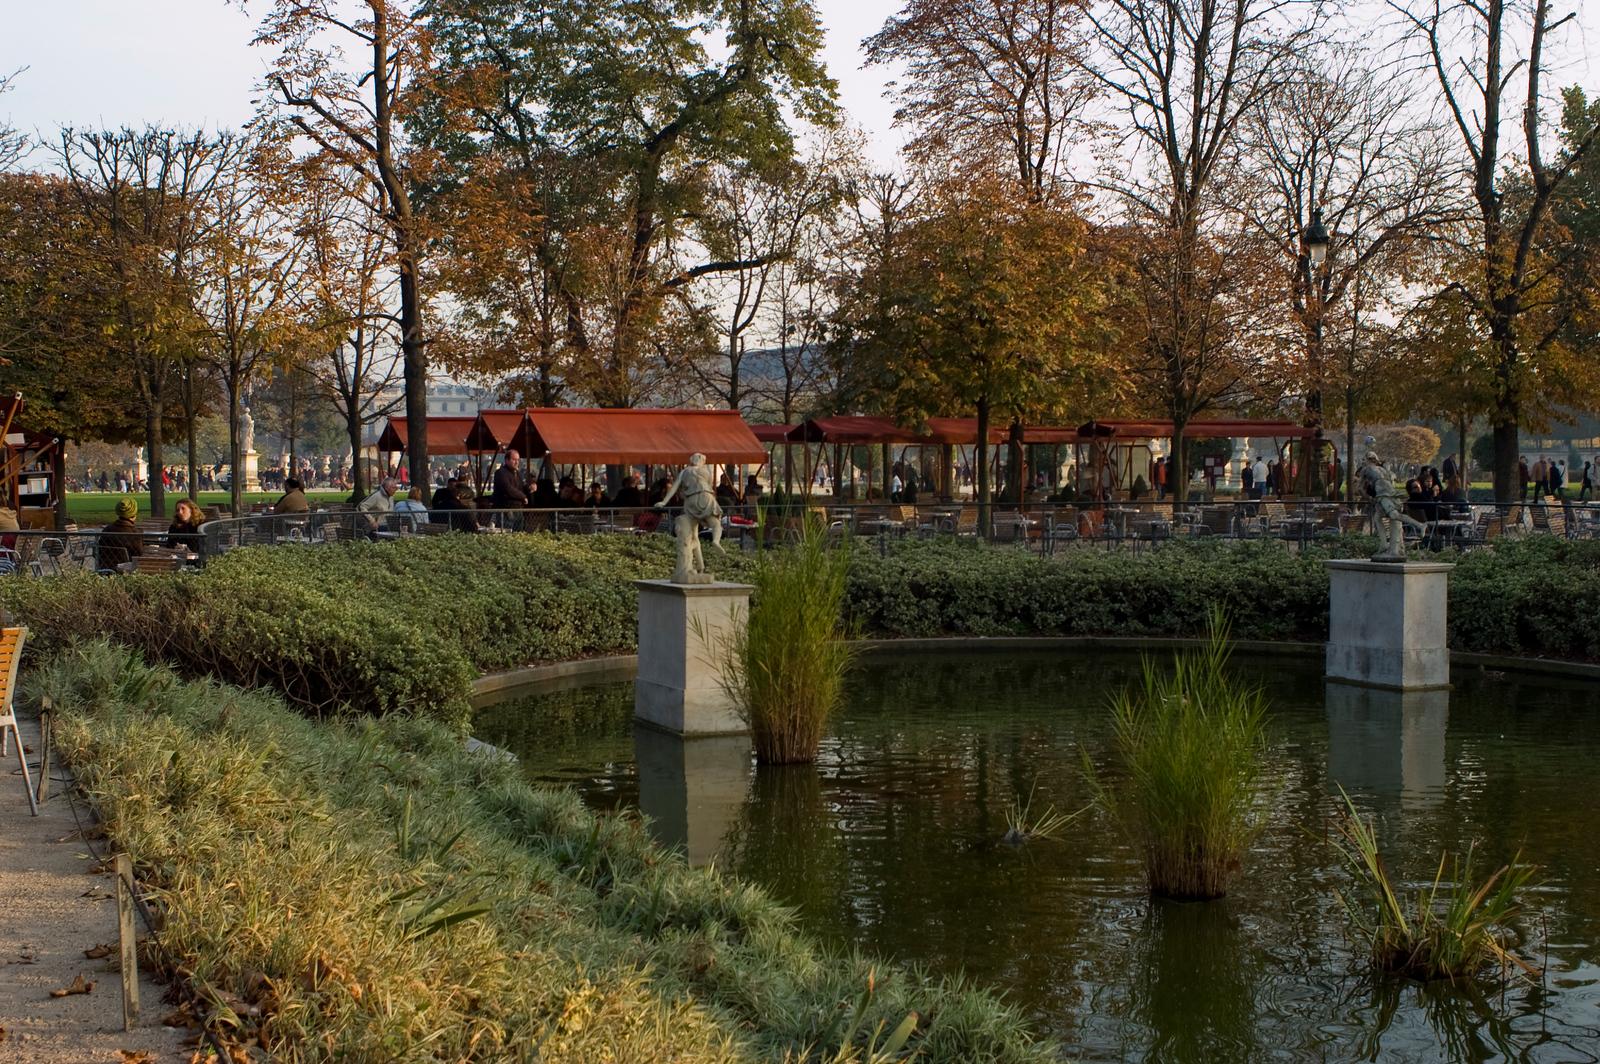 Paris, France, Public Parks, Tuileries Park, in Autumn, People Promenading, Panoramic VIew